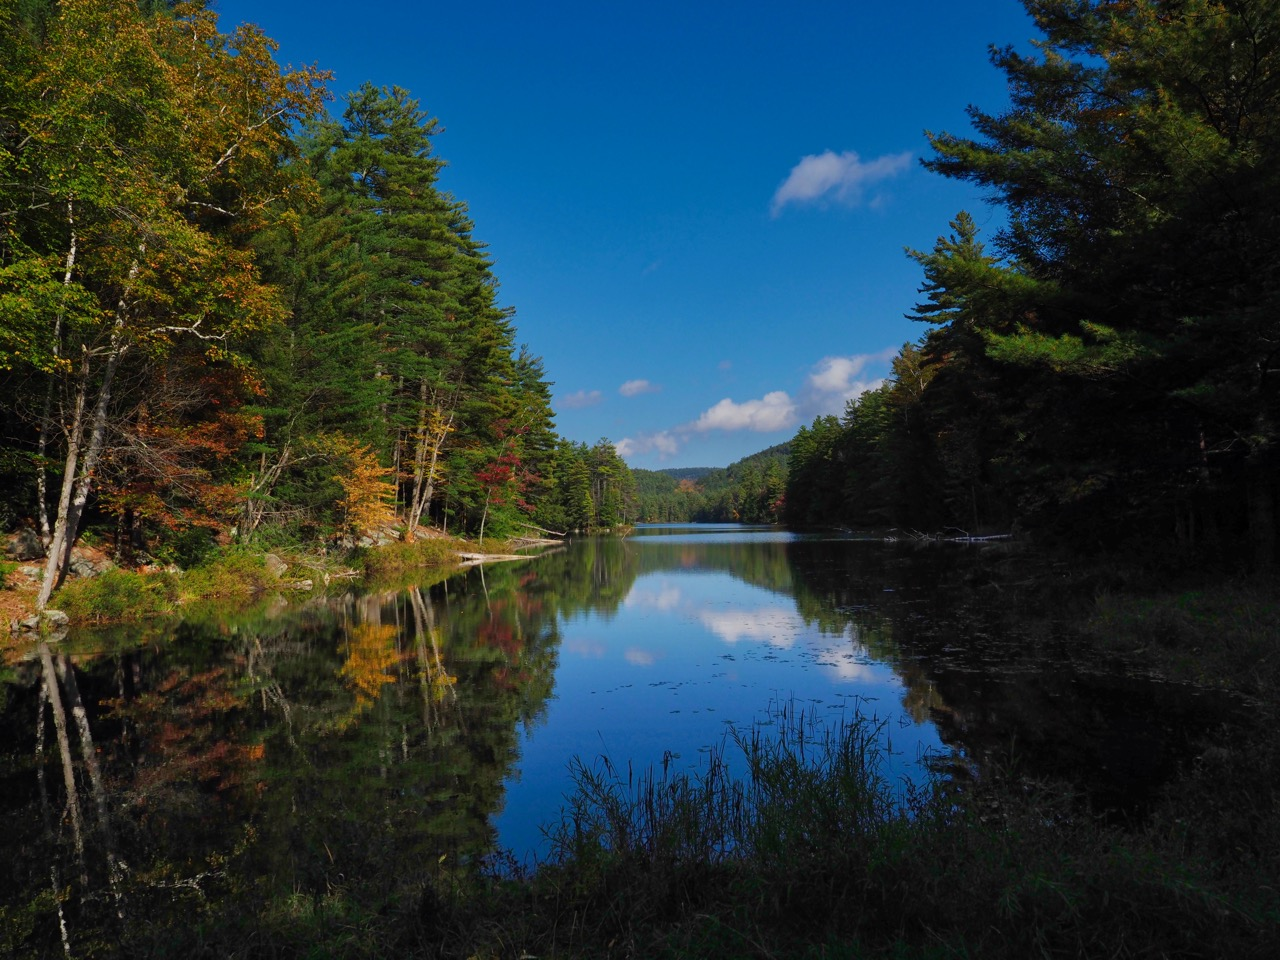 P26-reflections blue sky Pharaoh lake-PA100450.jpg